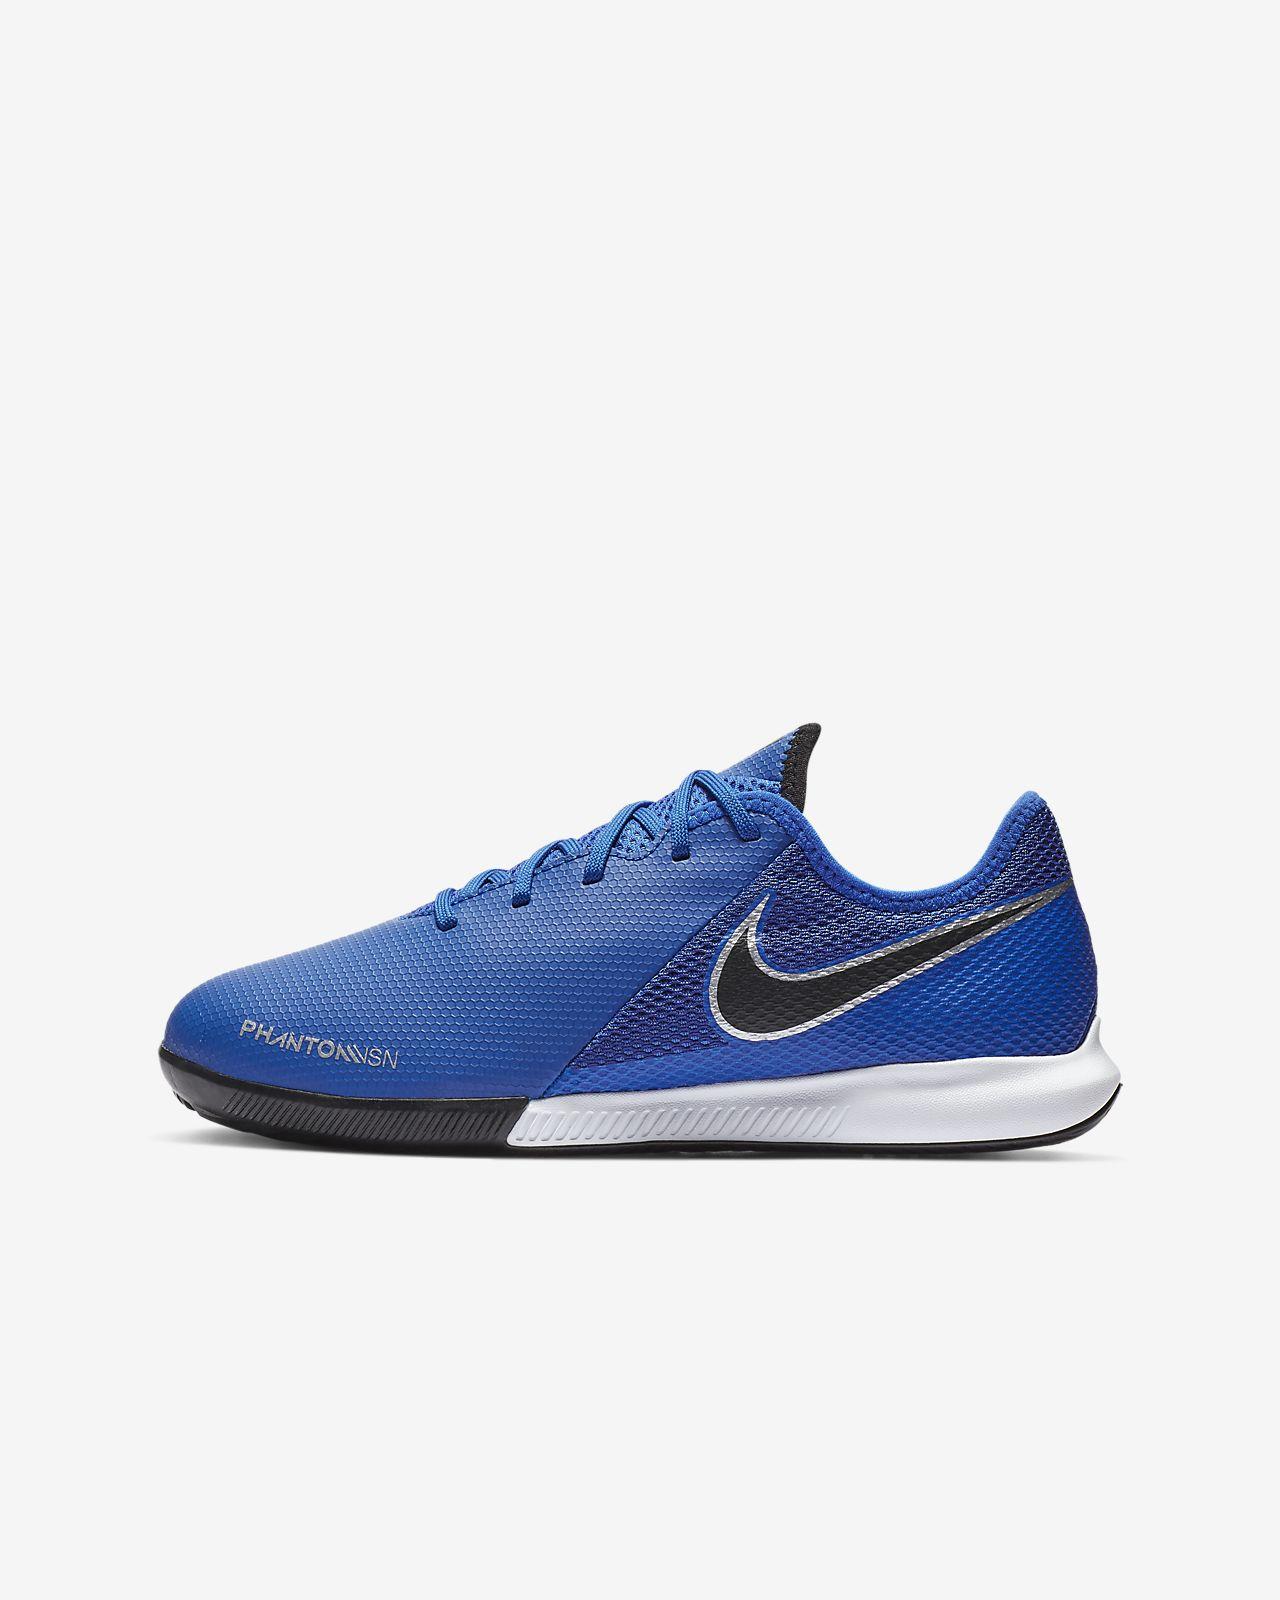 f129e7c19 ... Nike Jr. Phantom Vision Academy IC Younger Older Kids  Indoor Court  Football